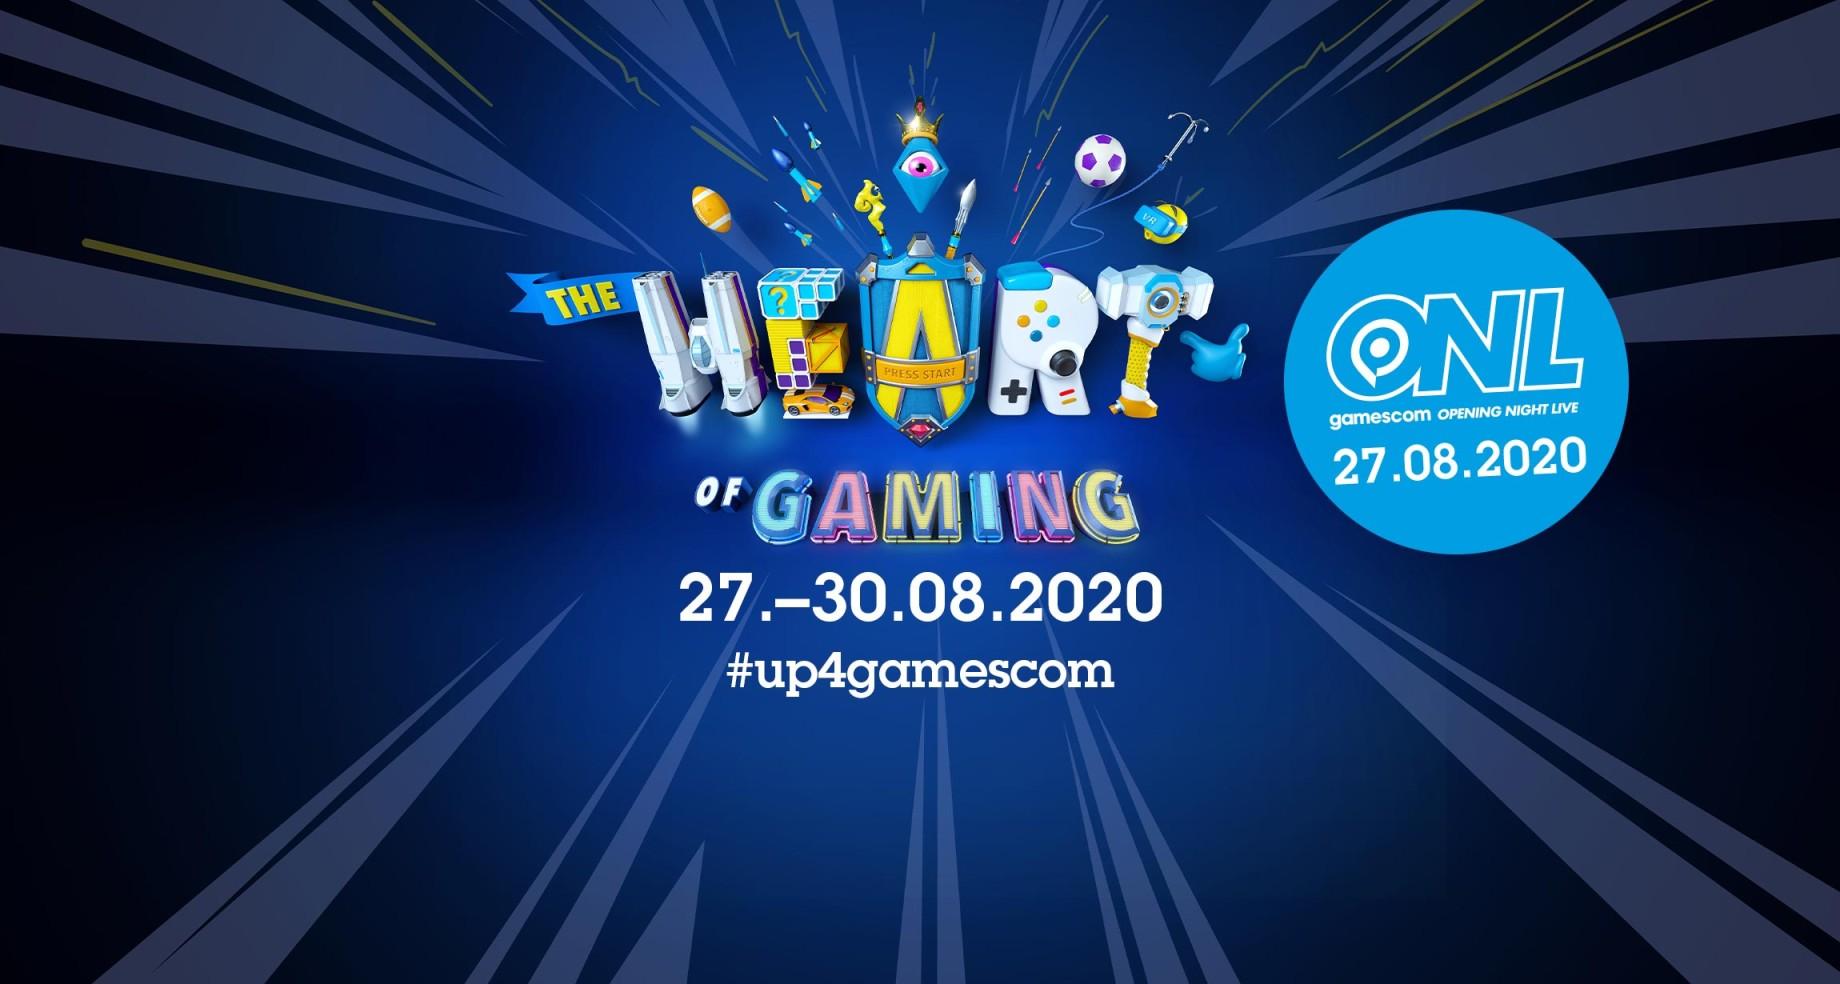 Gamescom пройдёт в цифровом формате с 27 по 30 августа